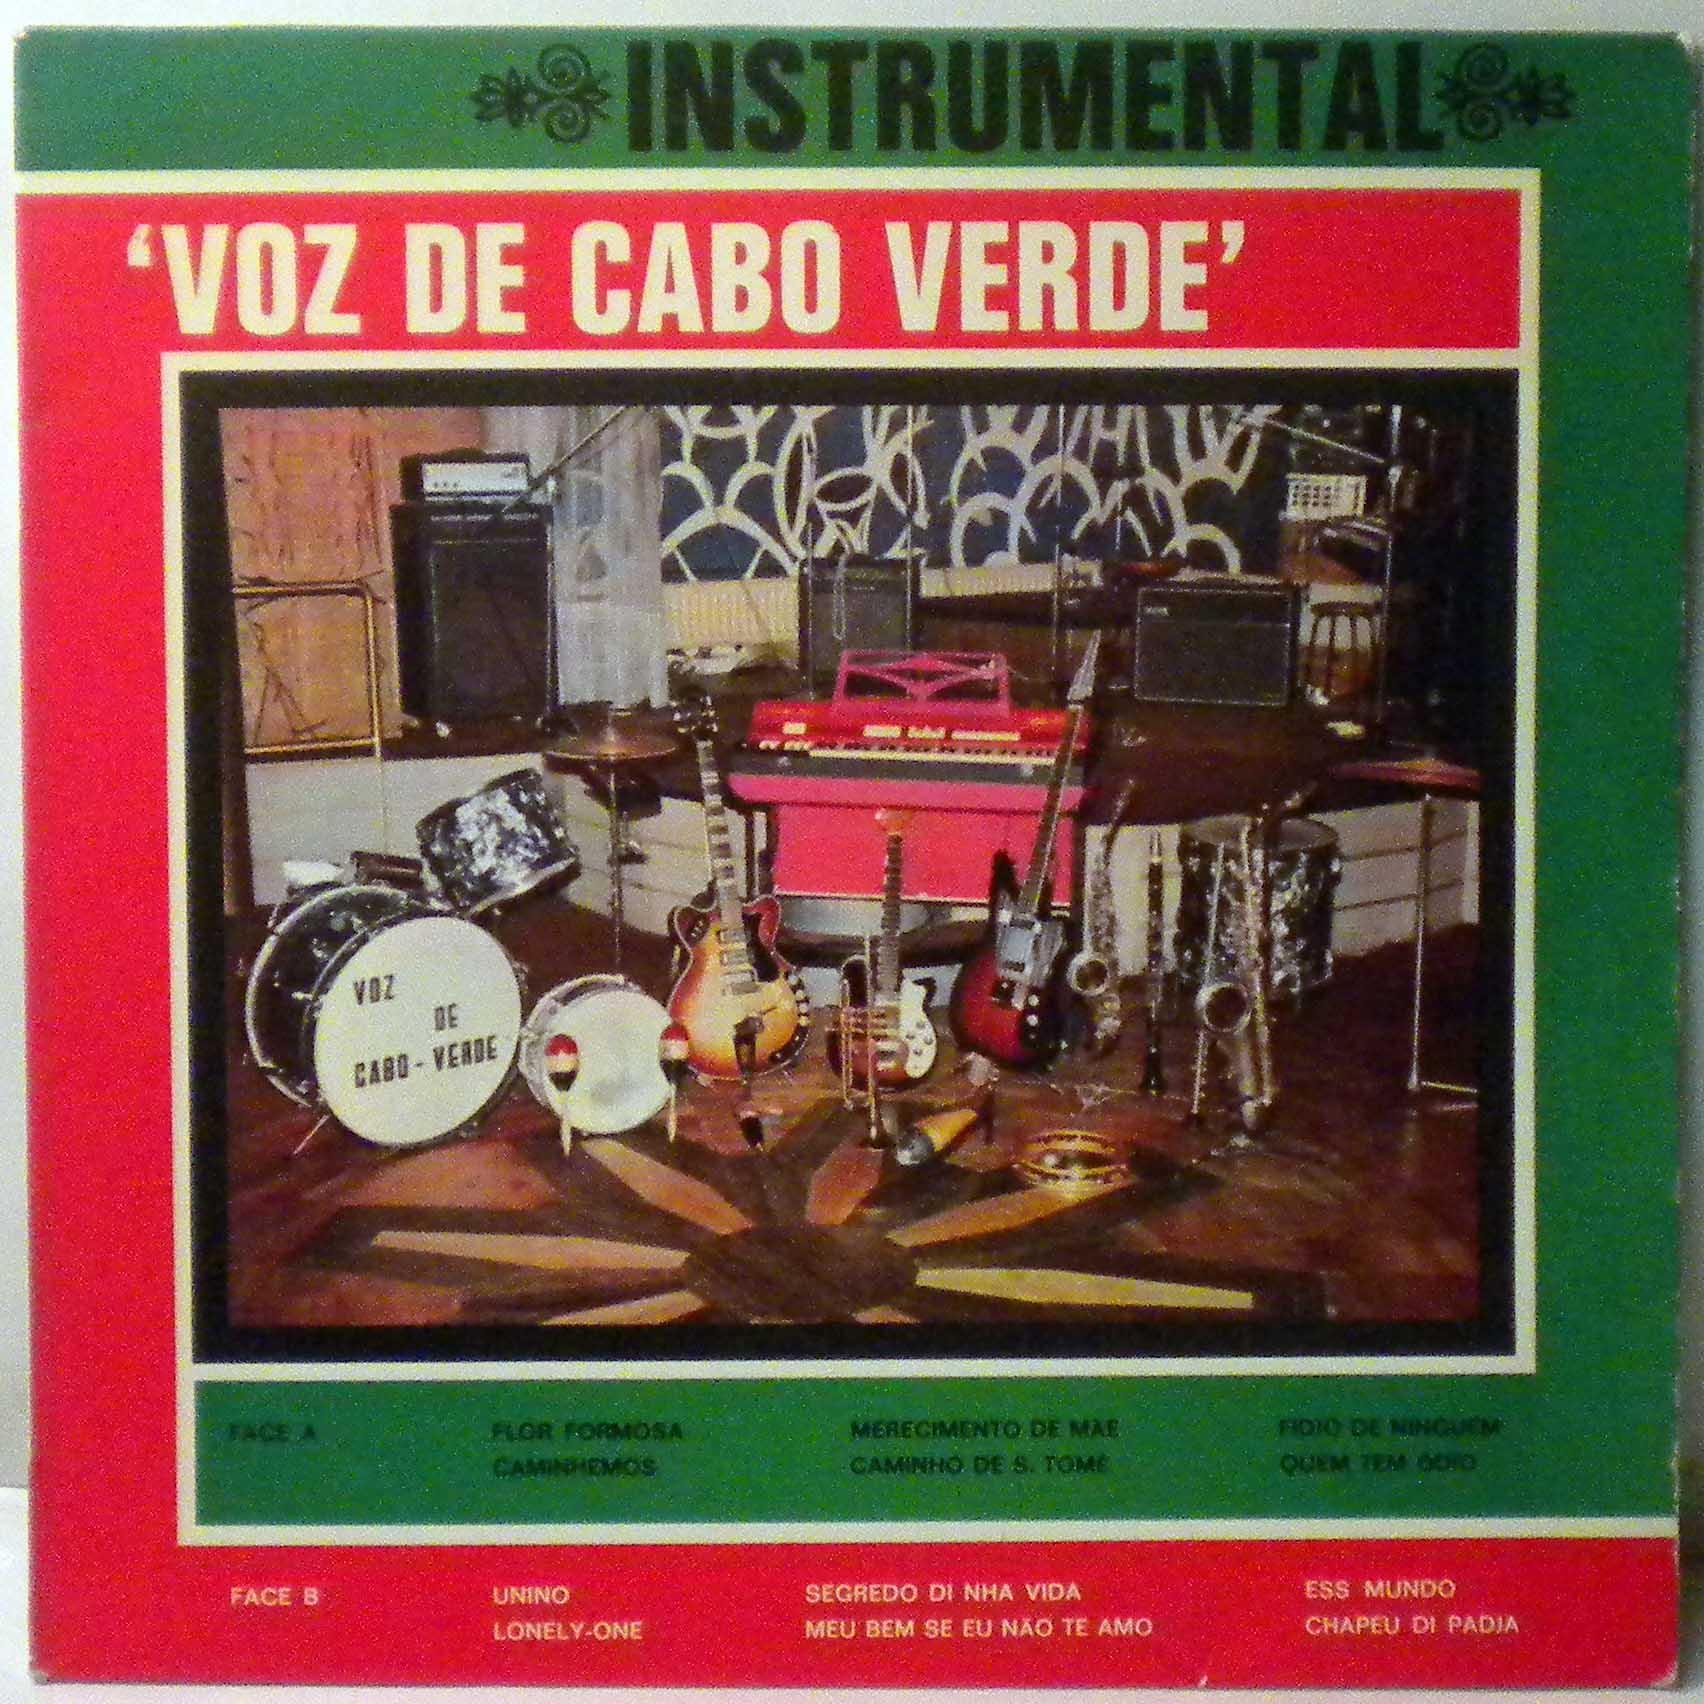 VOZ DE CABO VERDE - Instrumental - LP